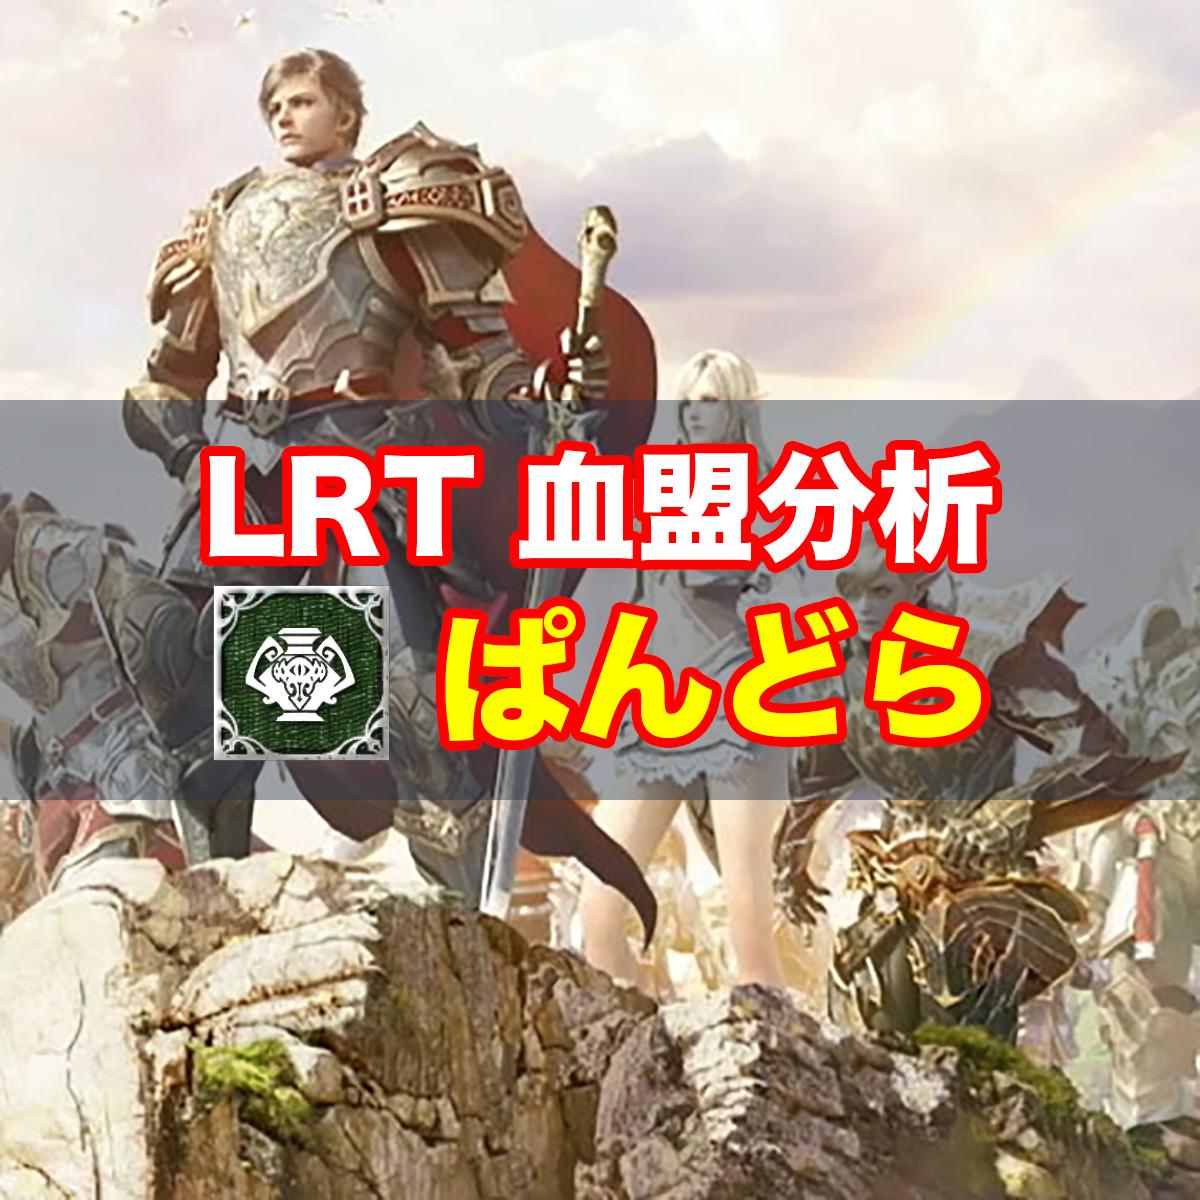 LRT出場血盟徹底分析『ぱんどら』